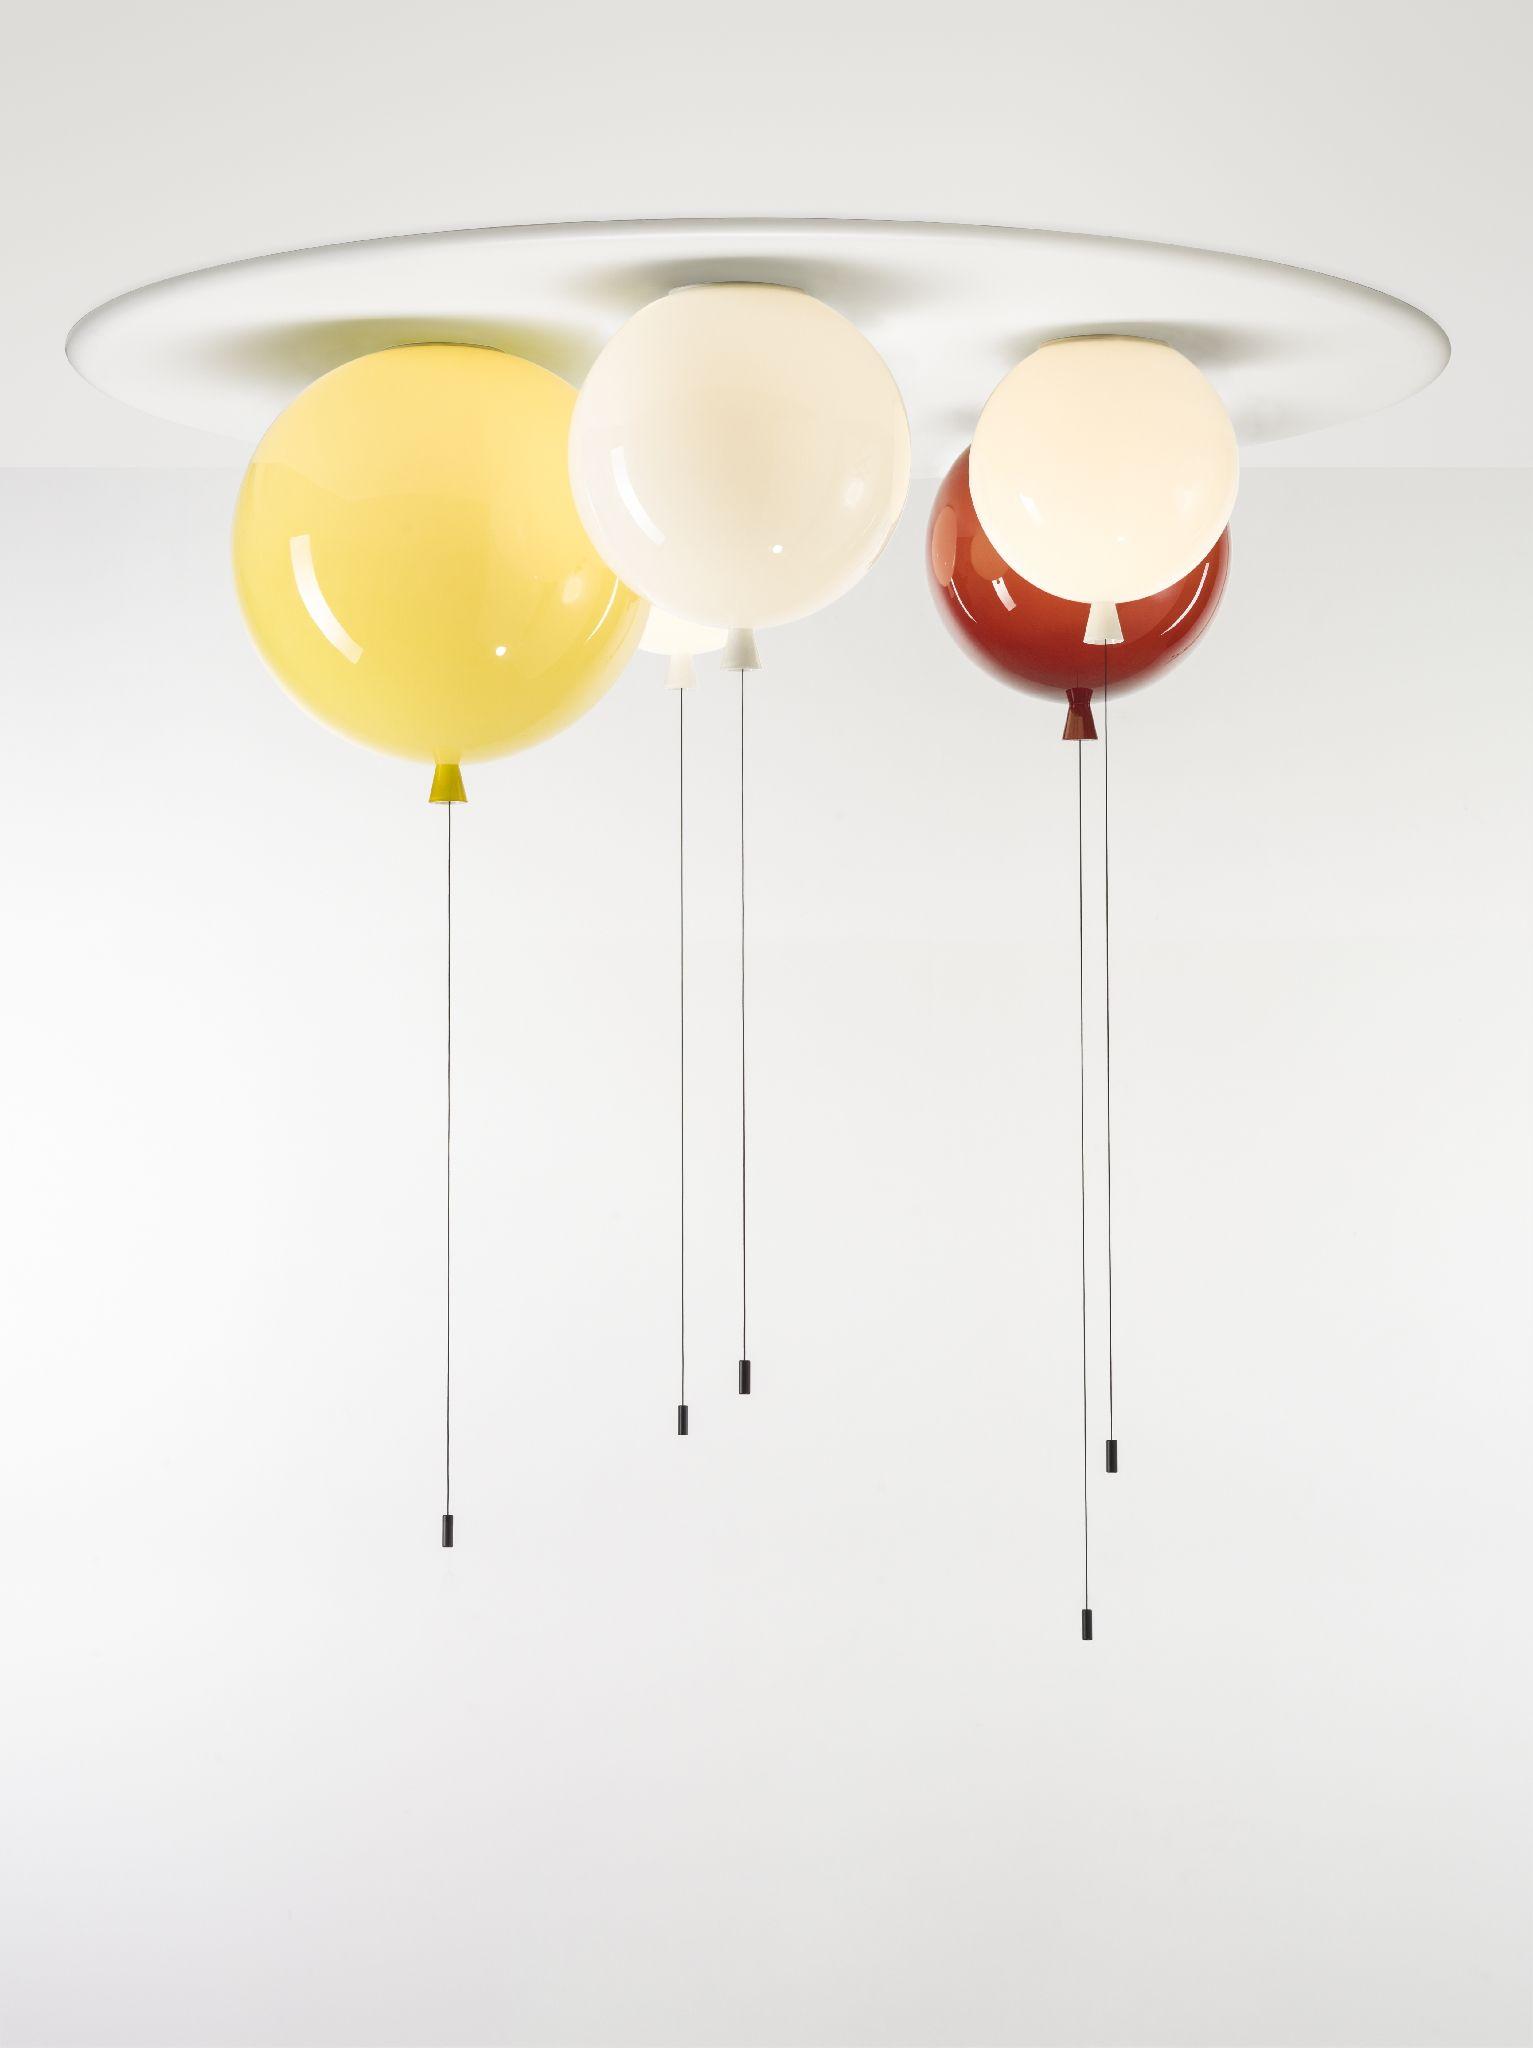 memory large yellow interior shop en online by design lamp memorybigyellow luxury brokis